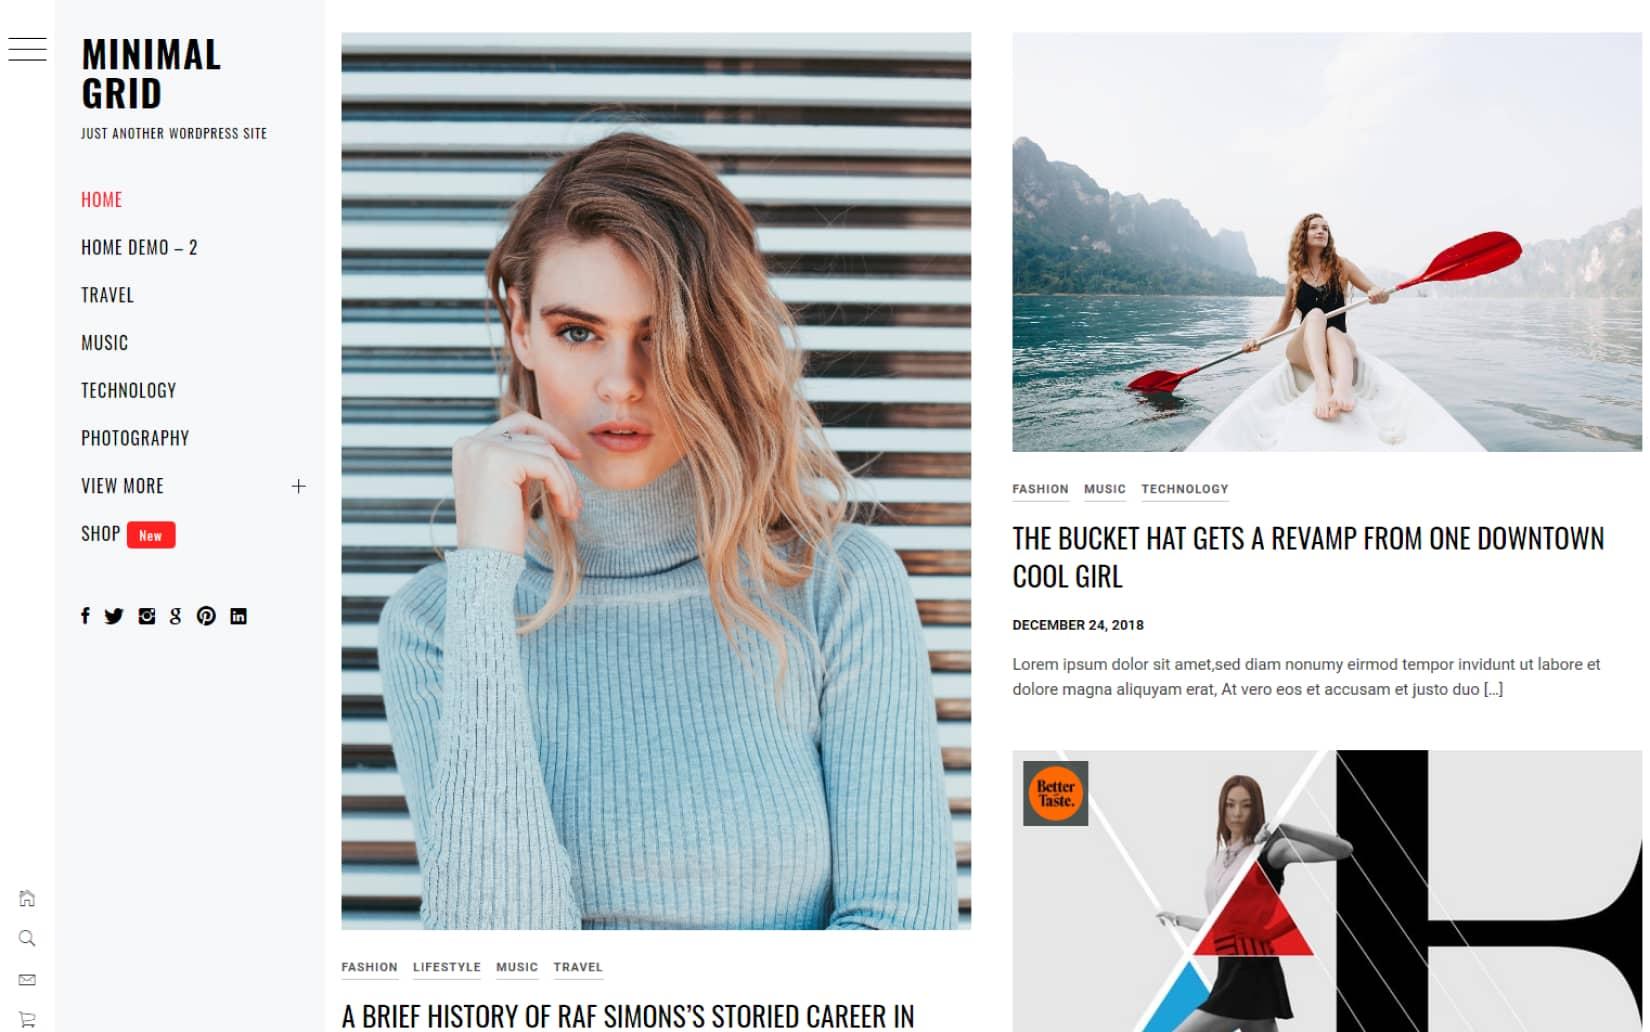 Minimal Grid a Free and Minimal Portfolio WordPress Theme